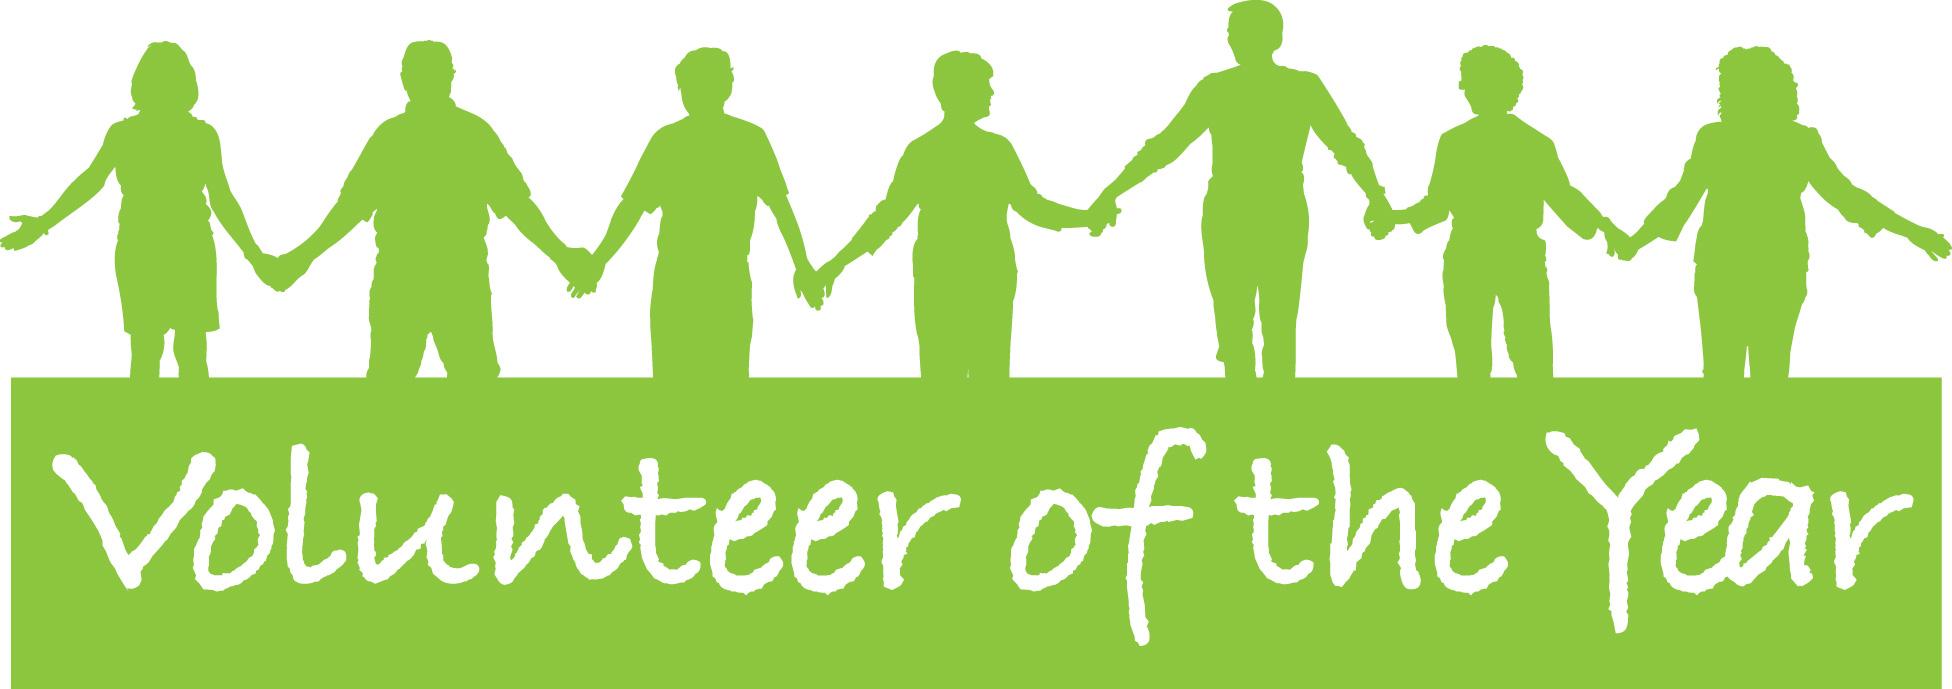 Volunteer of the year banner